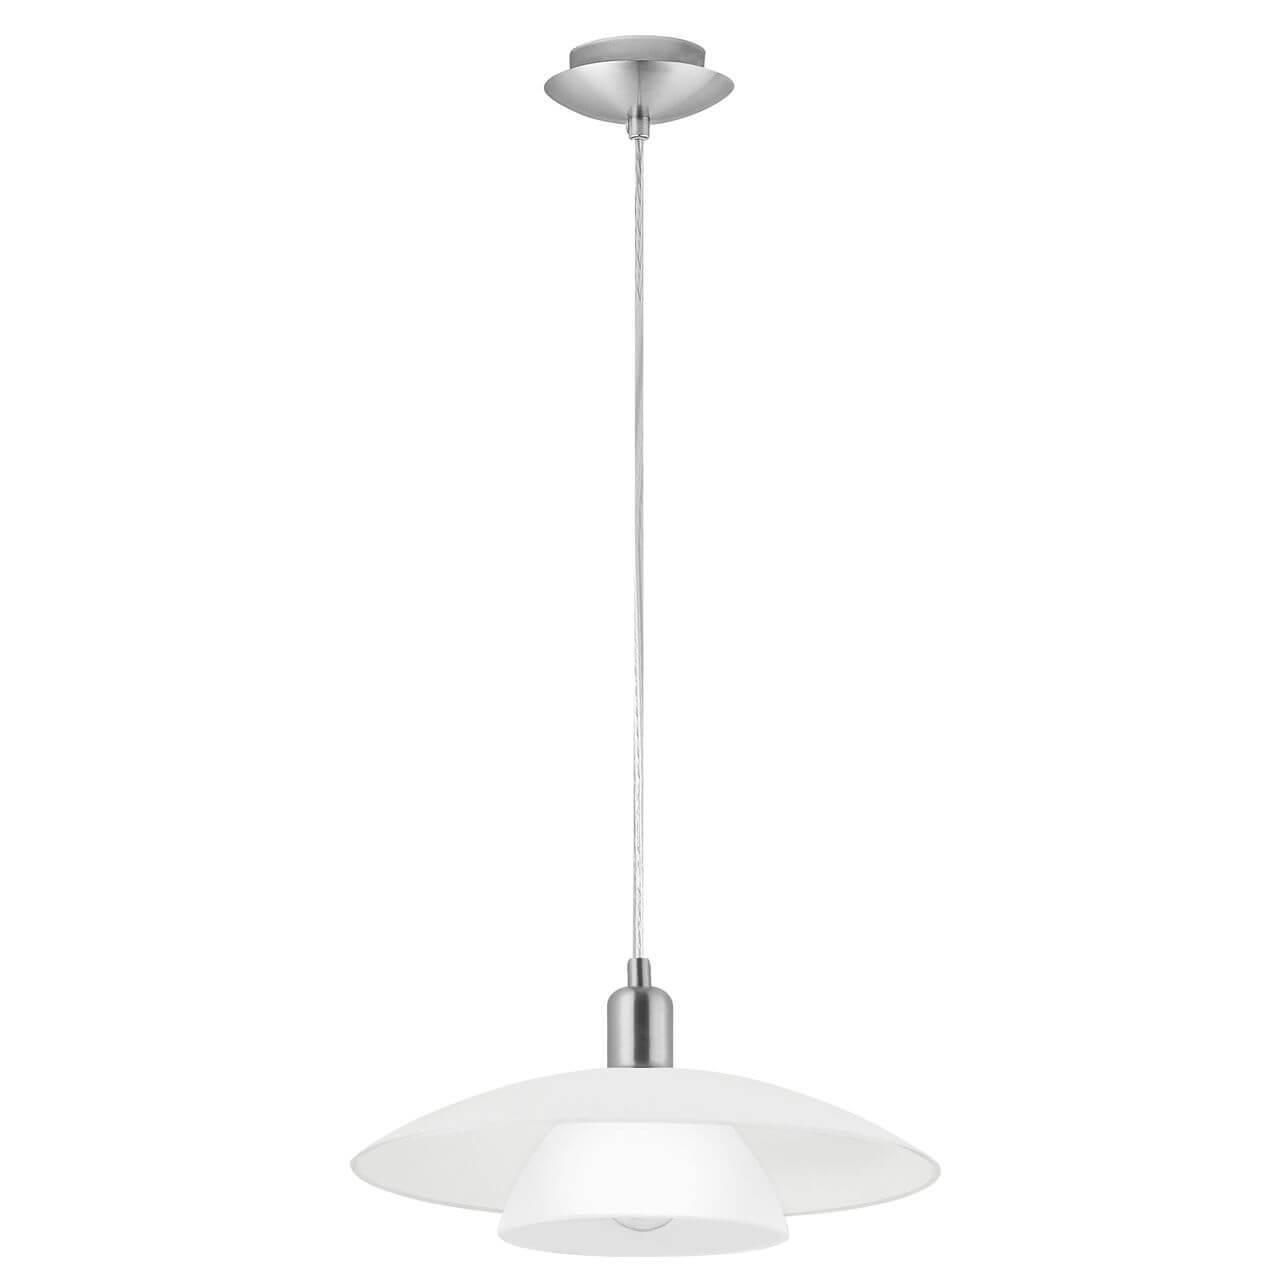 Подвесной светильник Eglo 87052, E27, 60 Вт eglo 87052